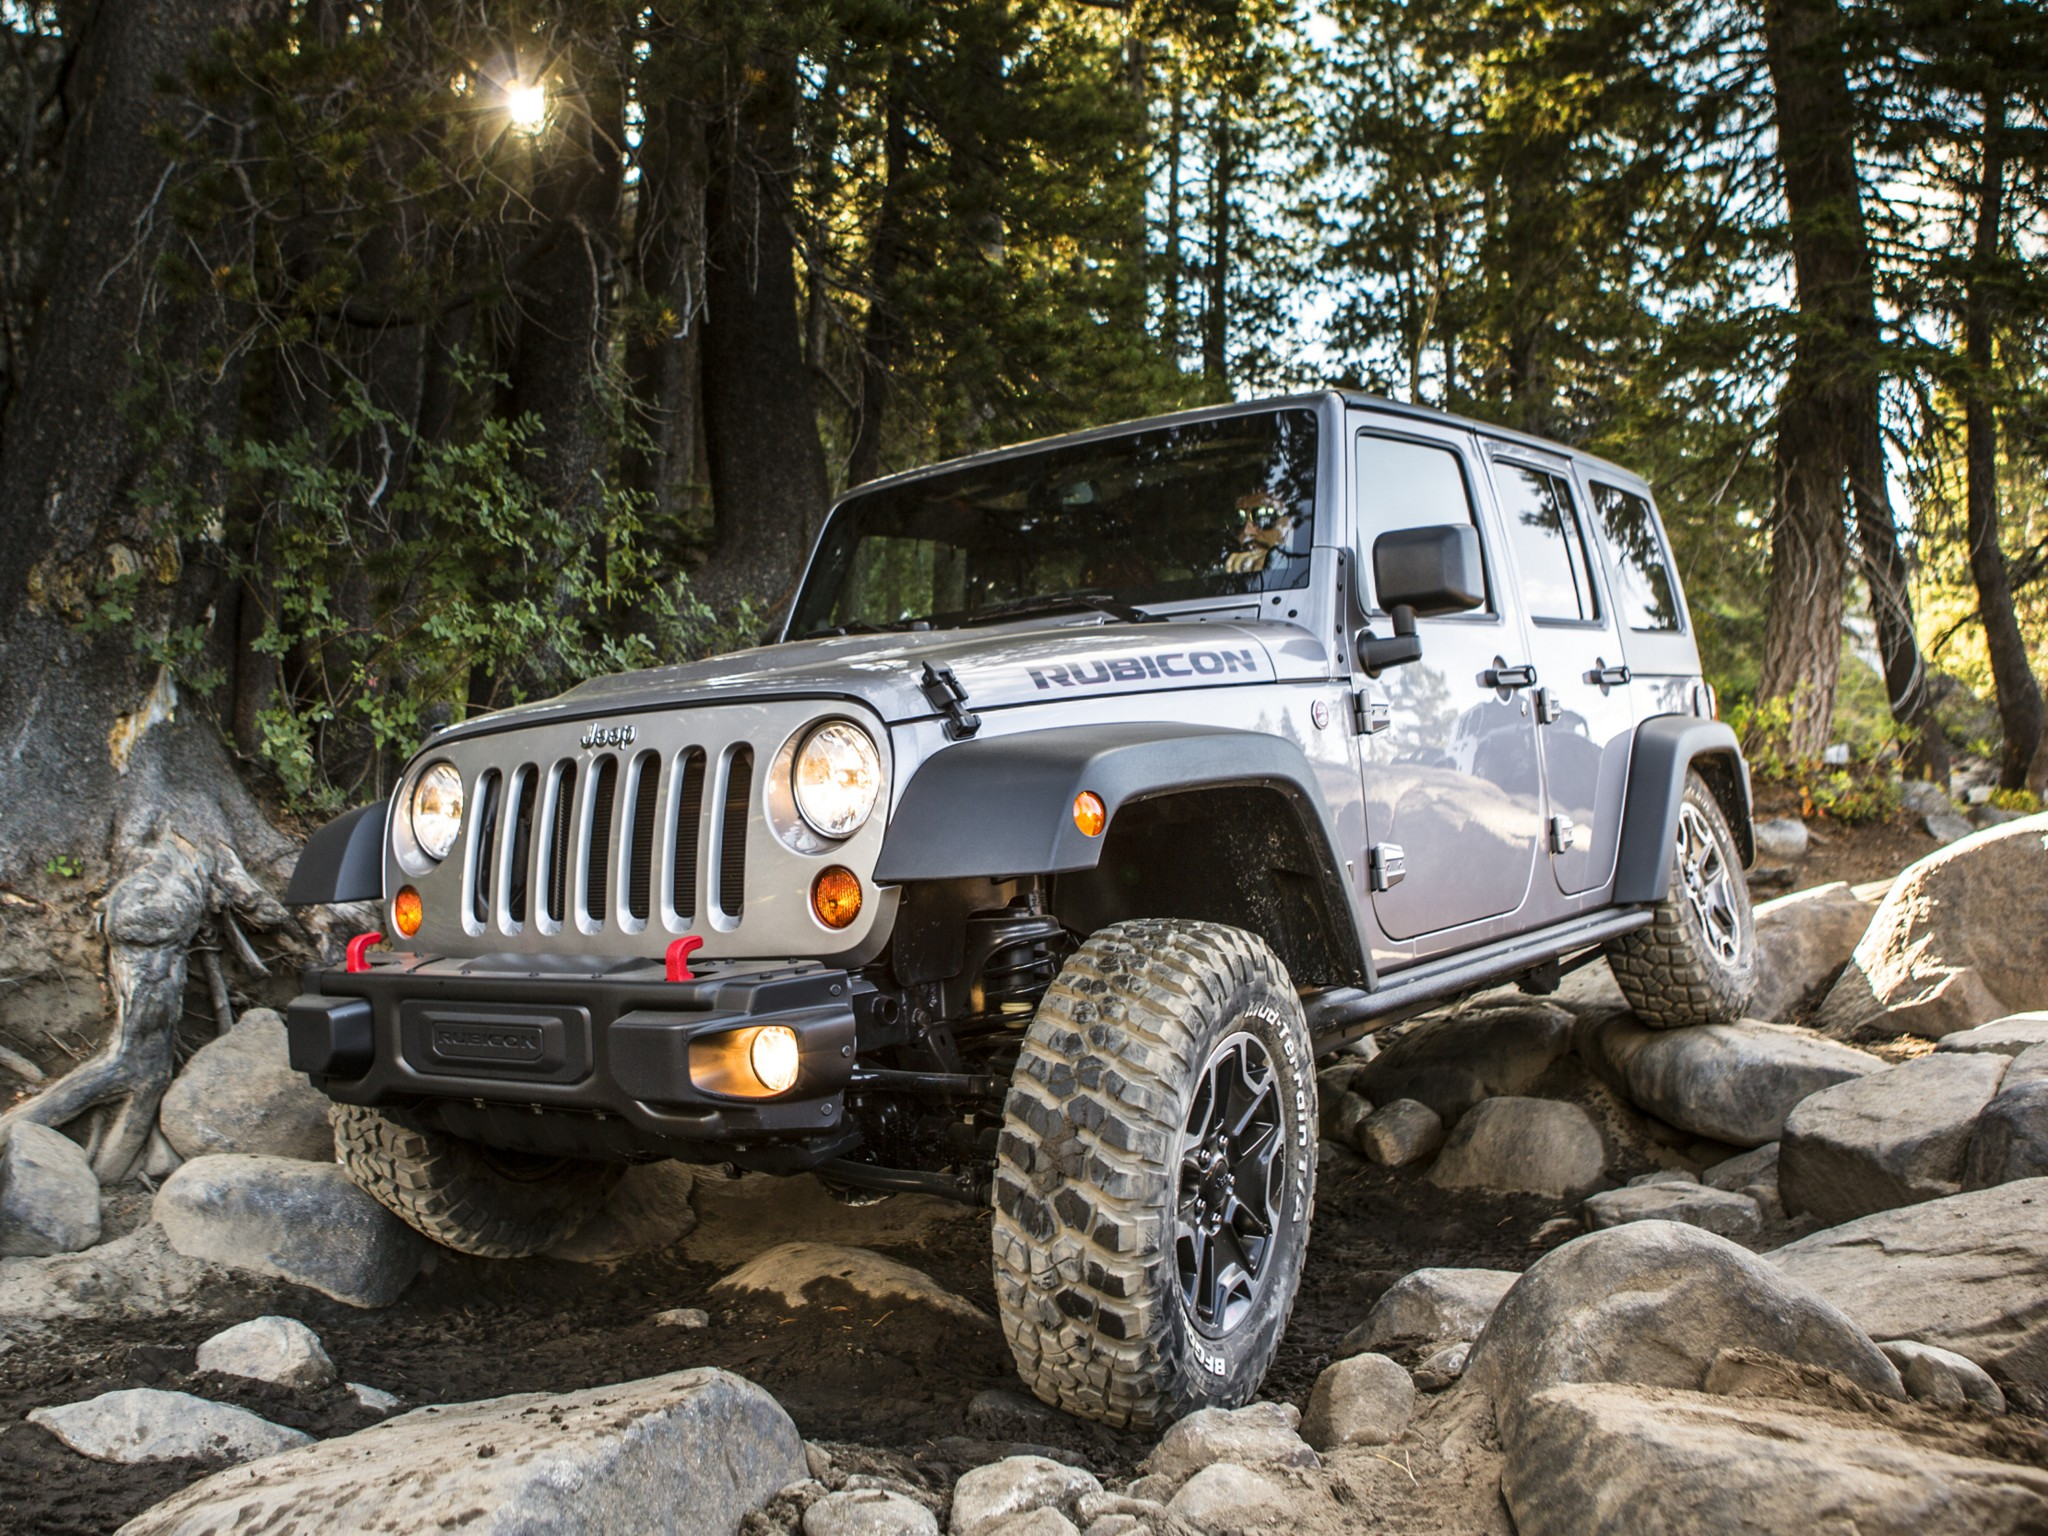 Jeep Wrangler Unlimited Altitude >> Jeep Wrangler Unlimited Wallpaper - WallpaperSafari